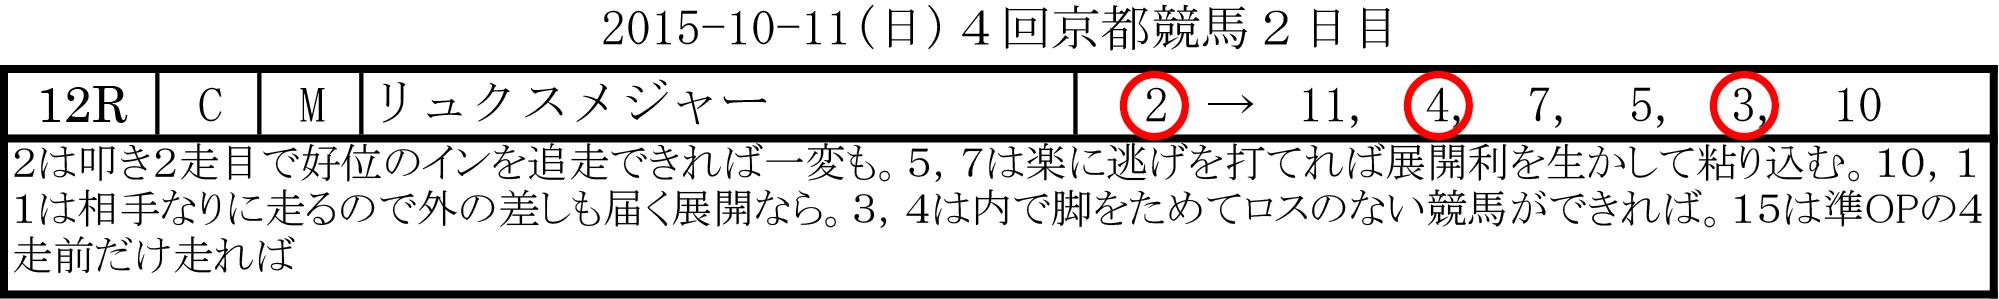 yoso_151011_kyoto12r